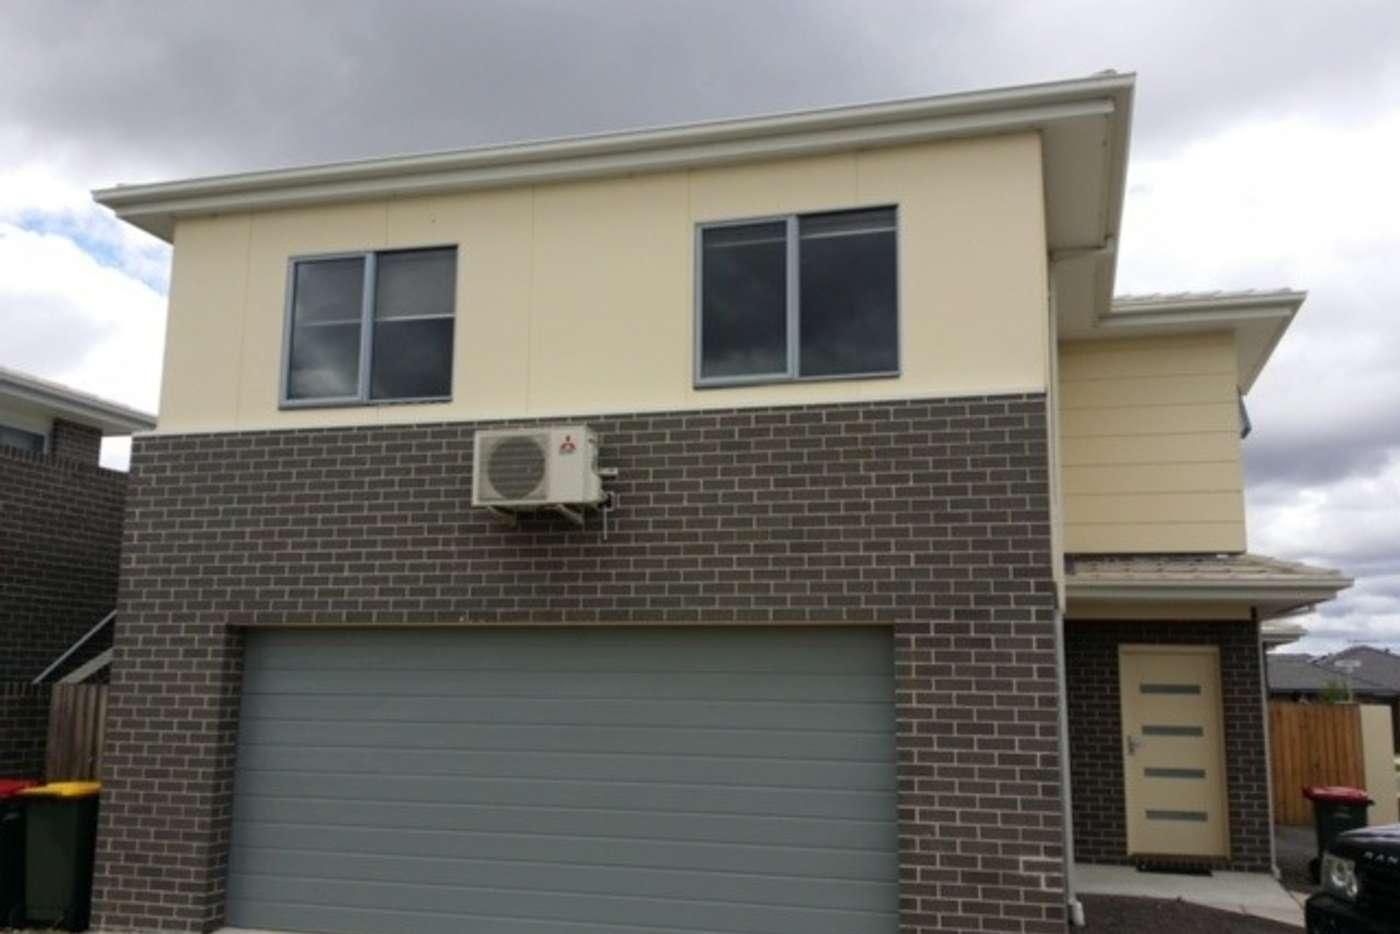 Main view of Homely studio listing, 5a Irinyilli Street, Bonner ACT 2914